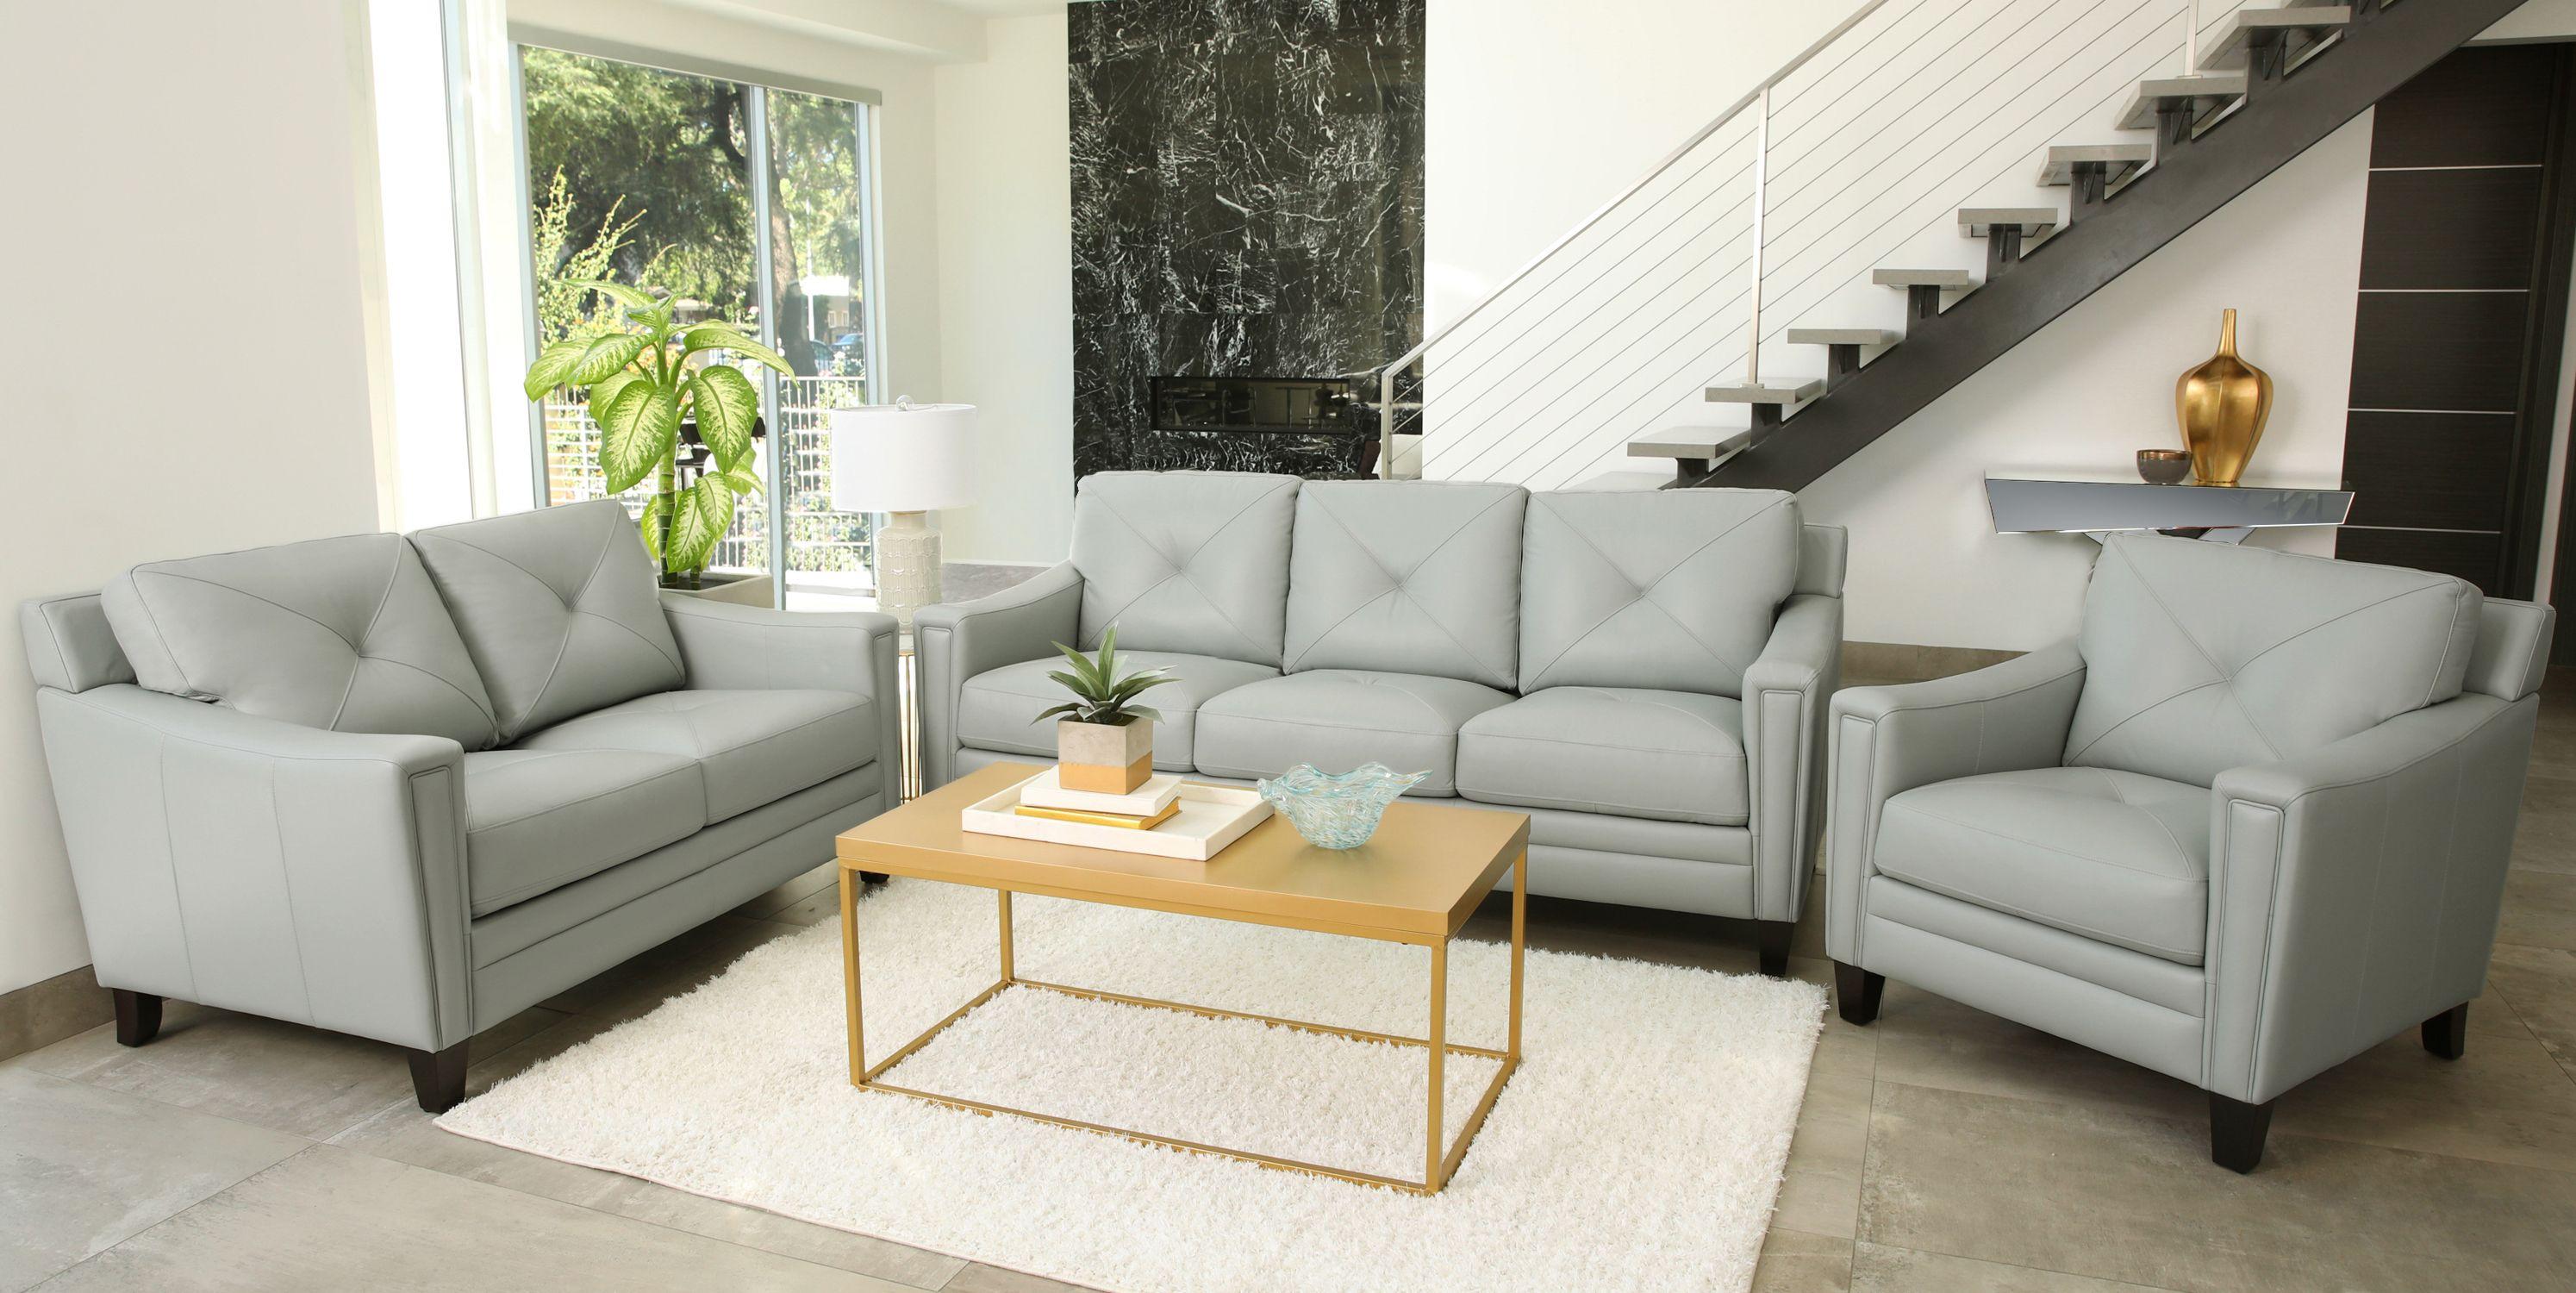 Fantastic Atmore 3 Piece Top Grain Leather Set Sofa Loveseat Chair Interior Design Ideas Skatsoteloinfo